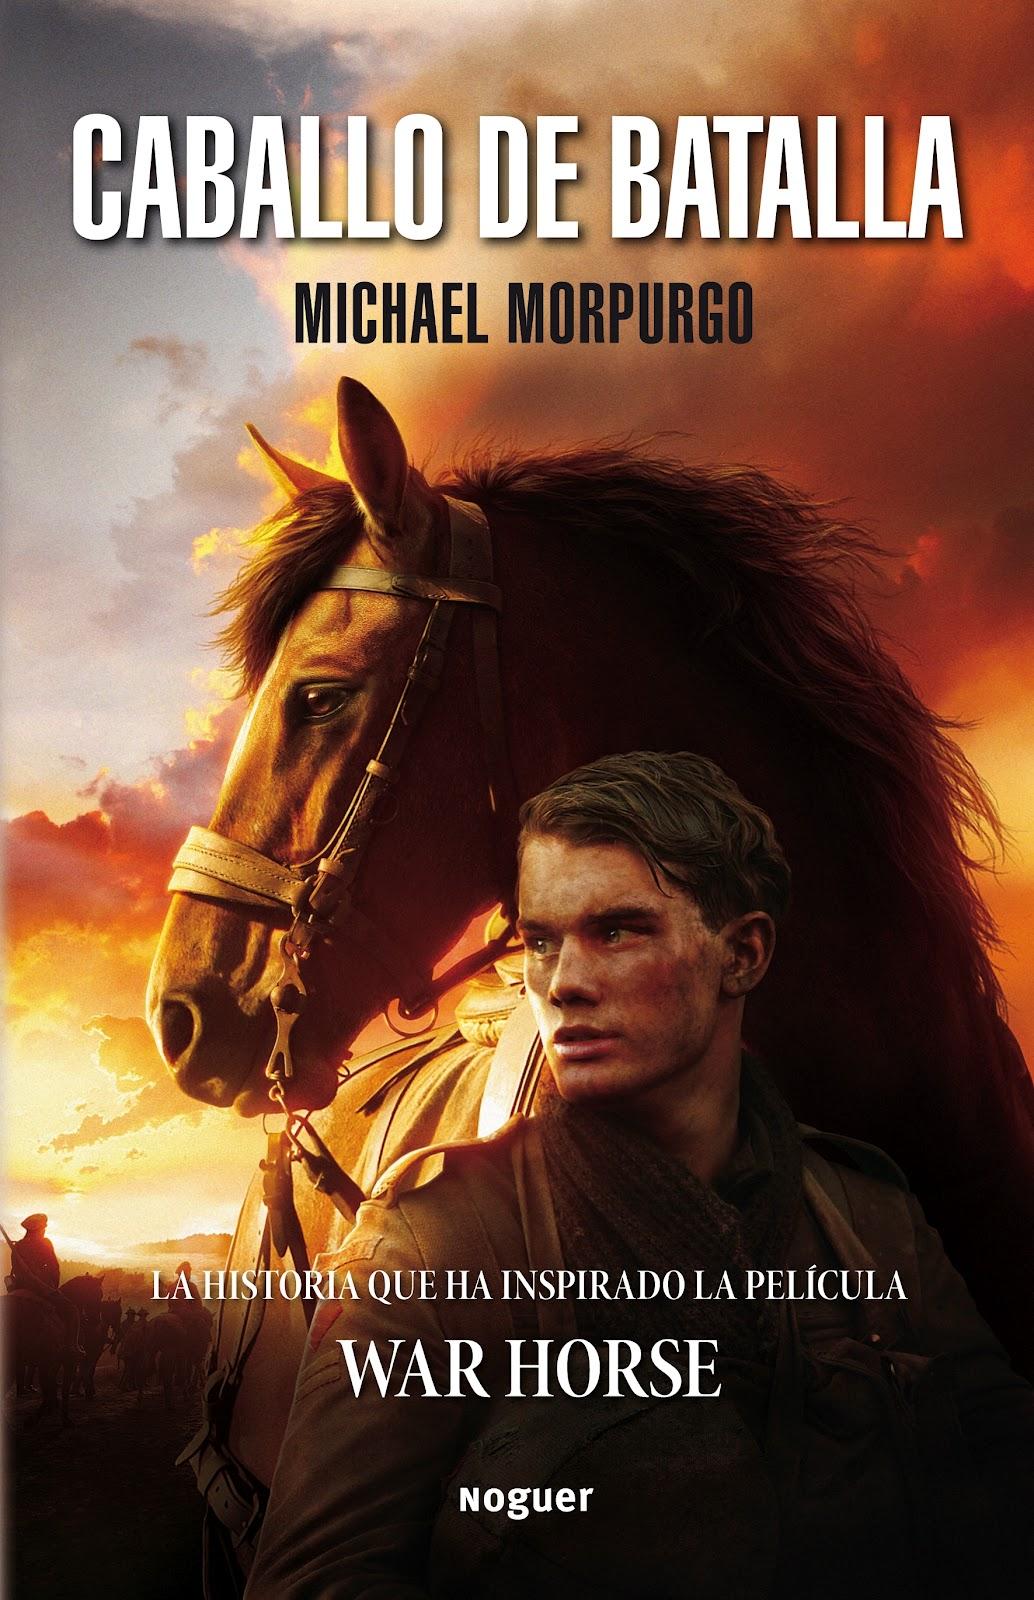 http://2.bp.blogspot.com/-gQf3sQ9yX20/T5buyNxVDvI/AAAAAAAAIuM/CMDxx4NyWJY/s1600/c_caballo_batalla_def-33b27ba.jpg